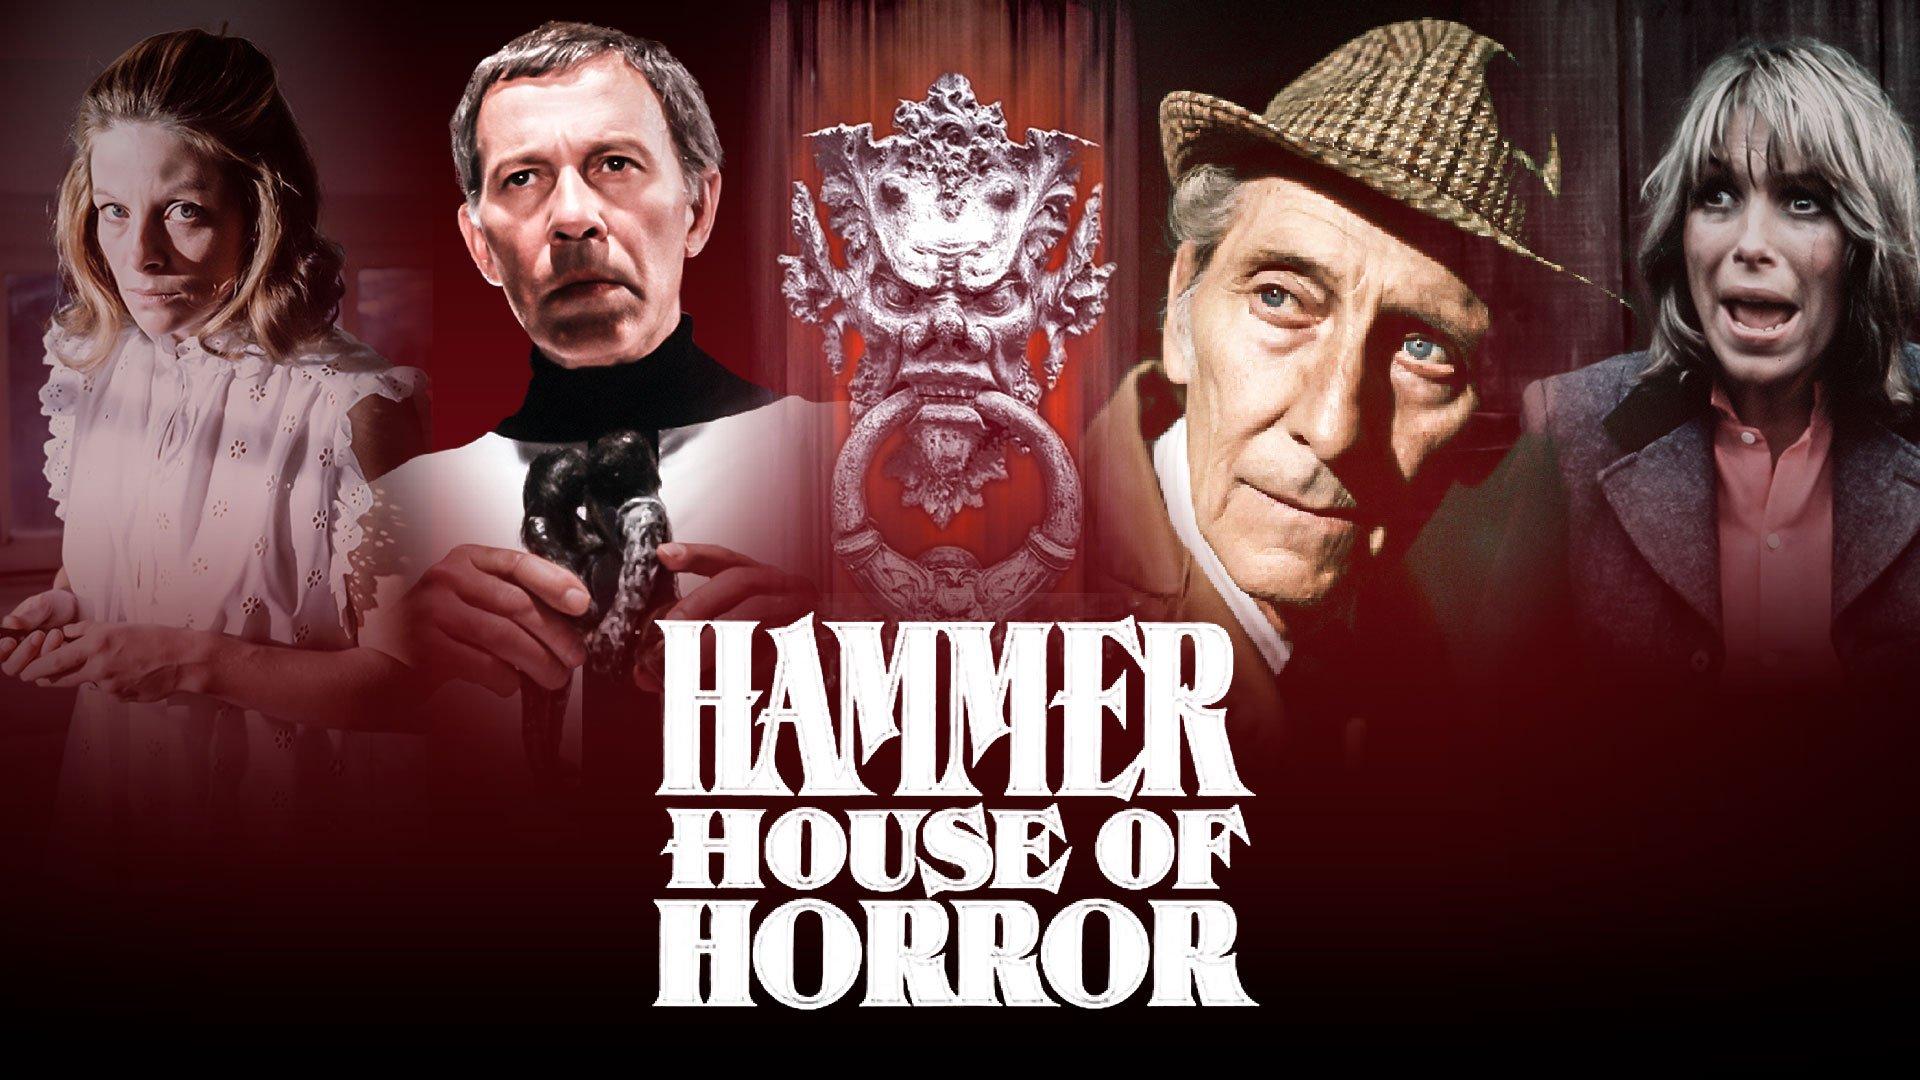 Hammer House of Horror on BritBox UK